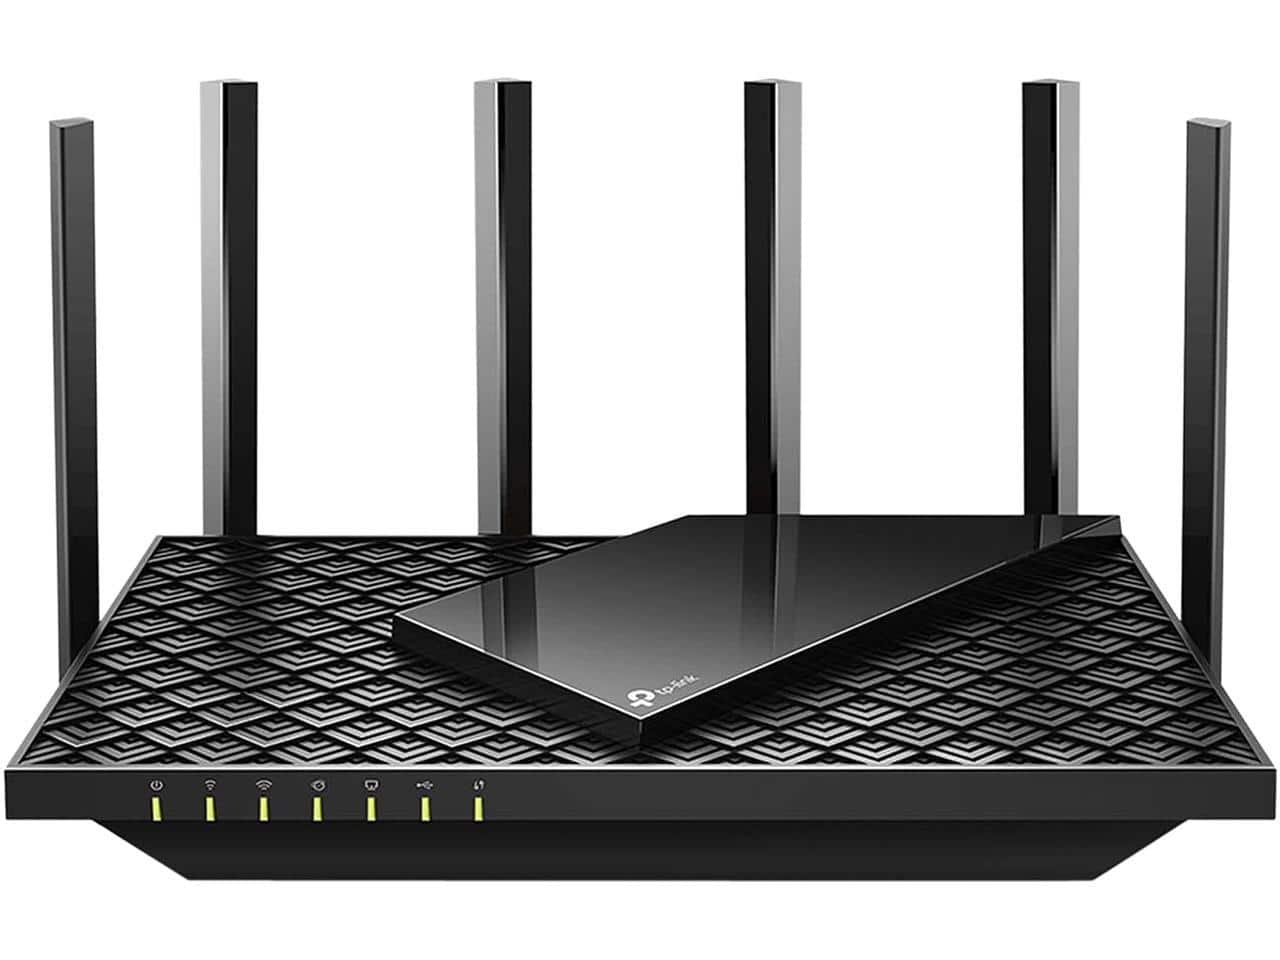 TP-Link Archer AX73 AX5400 Wireless Dual-Band Gigabit Router $165